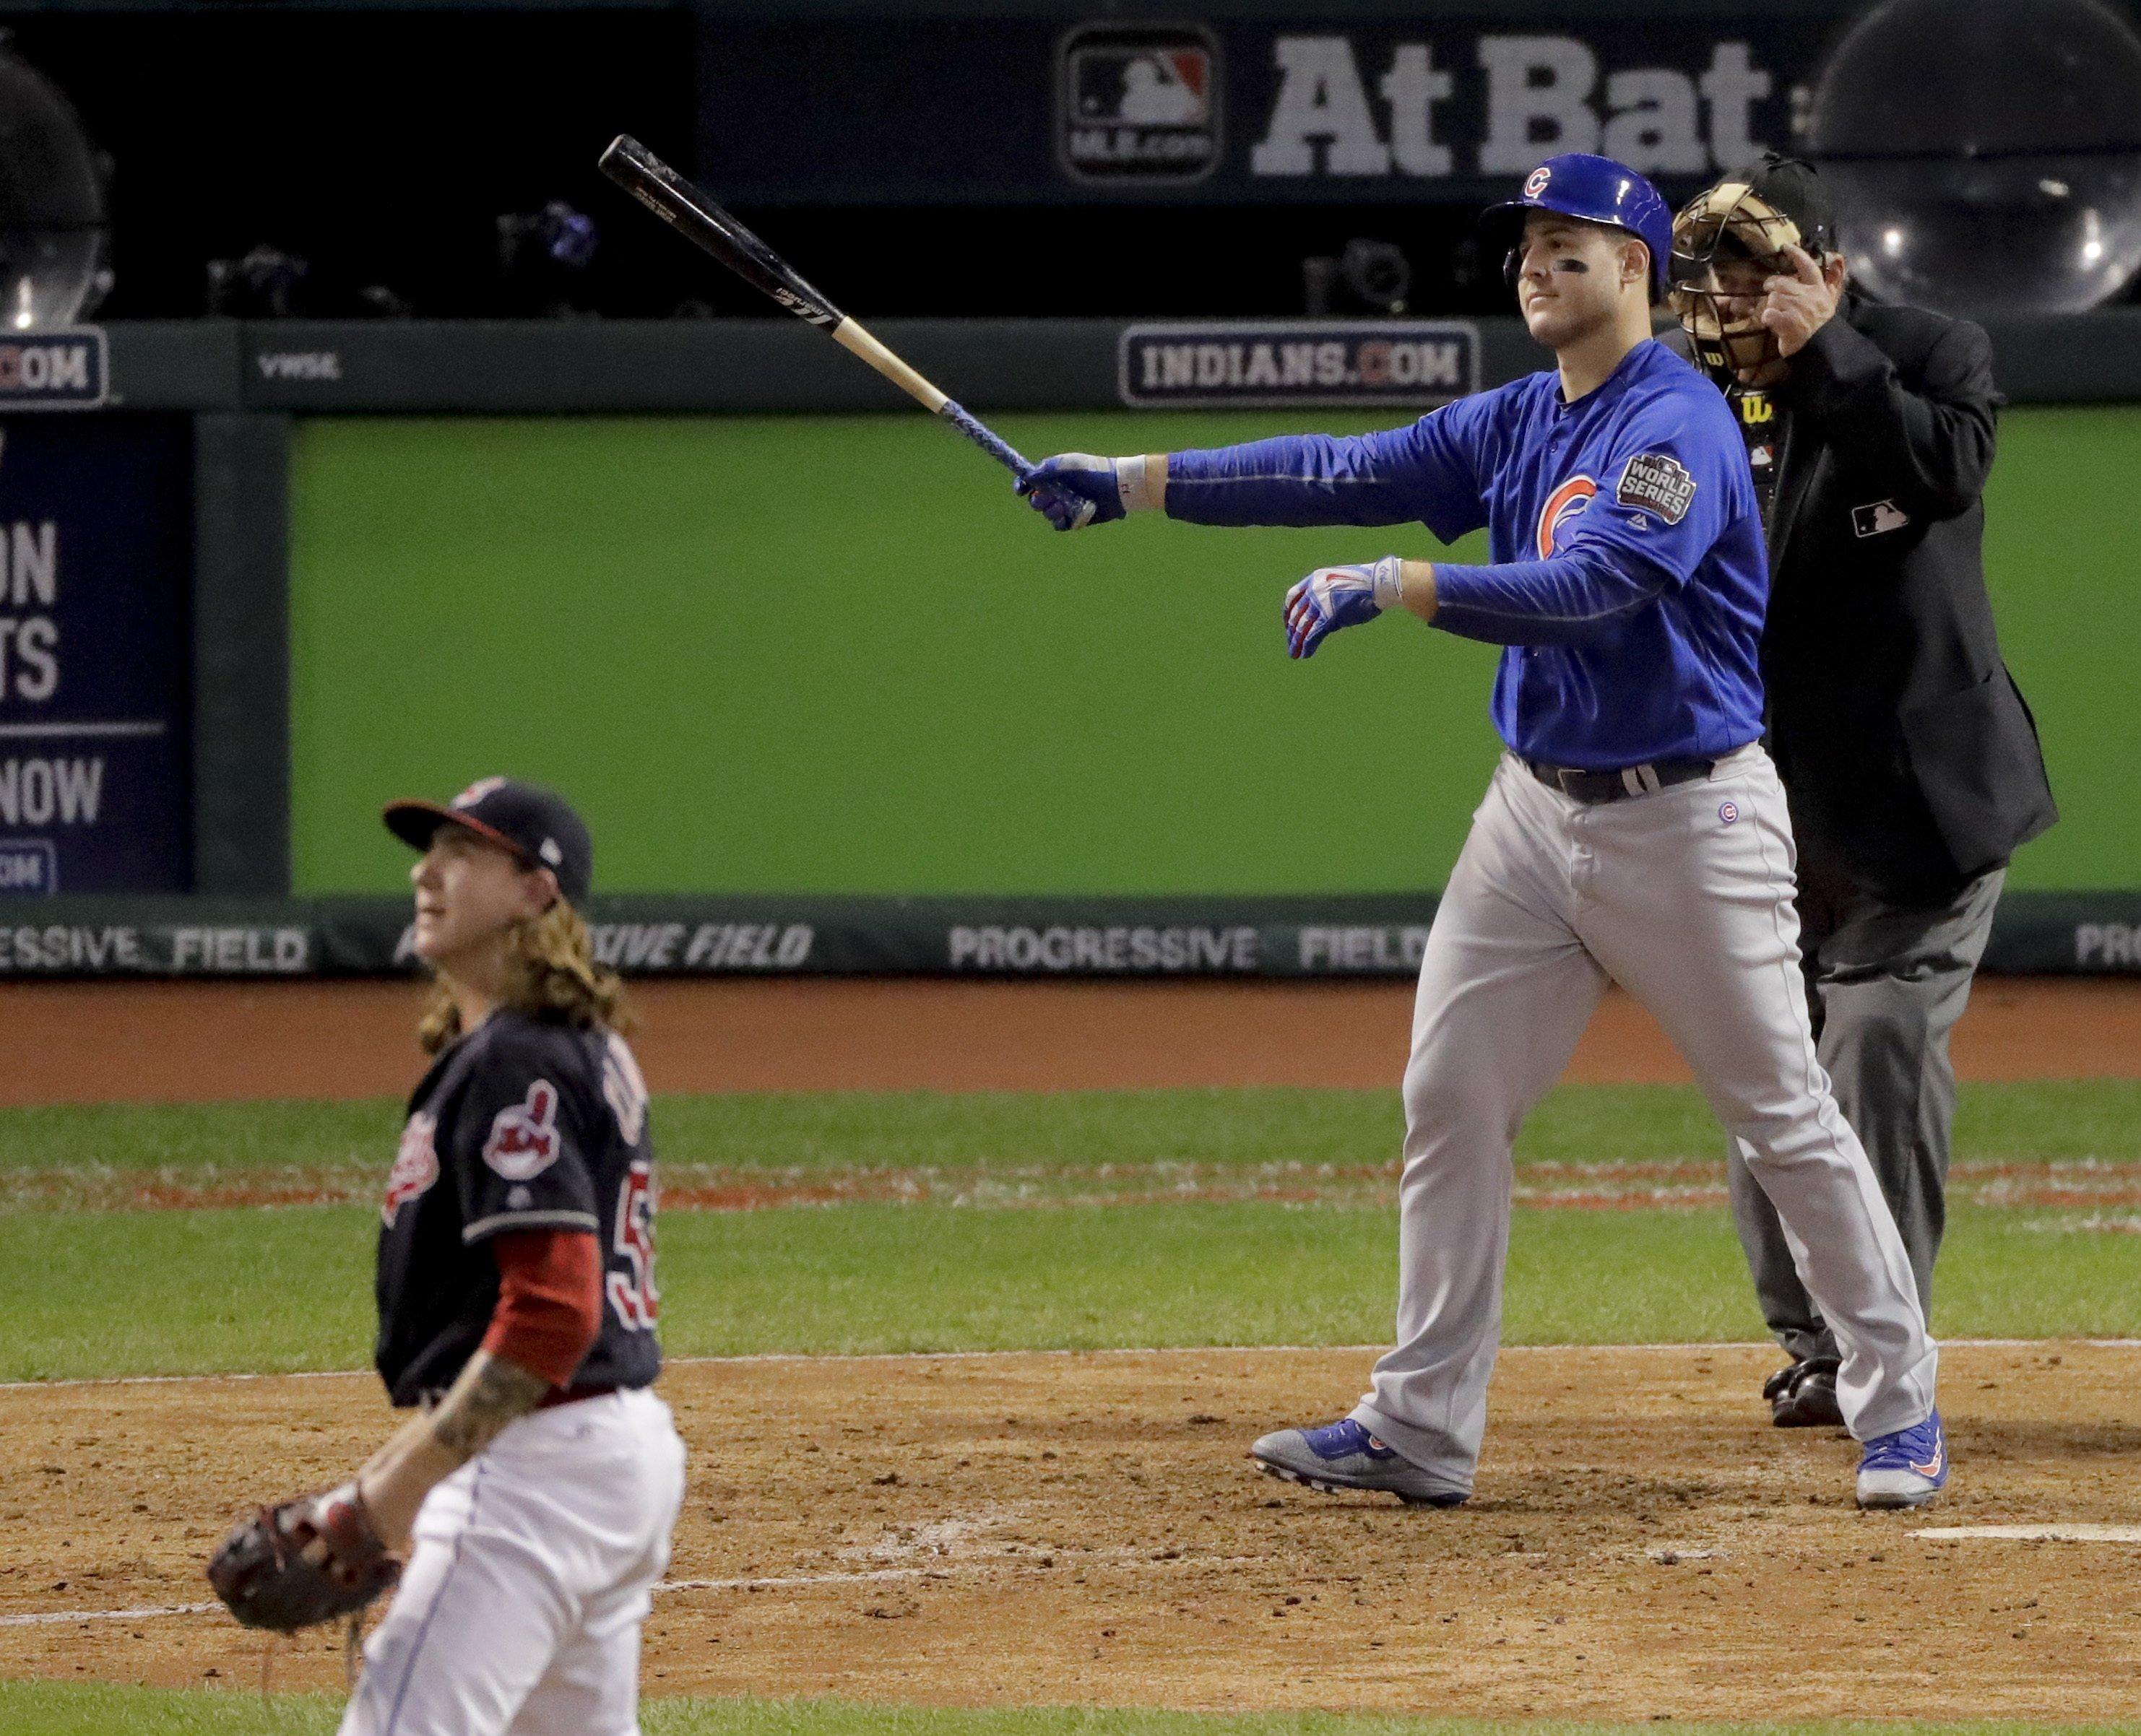 Dandy dozen: 12 players who could win World Series MVP award